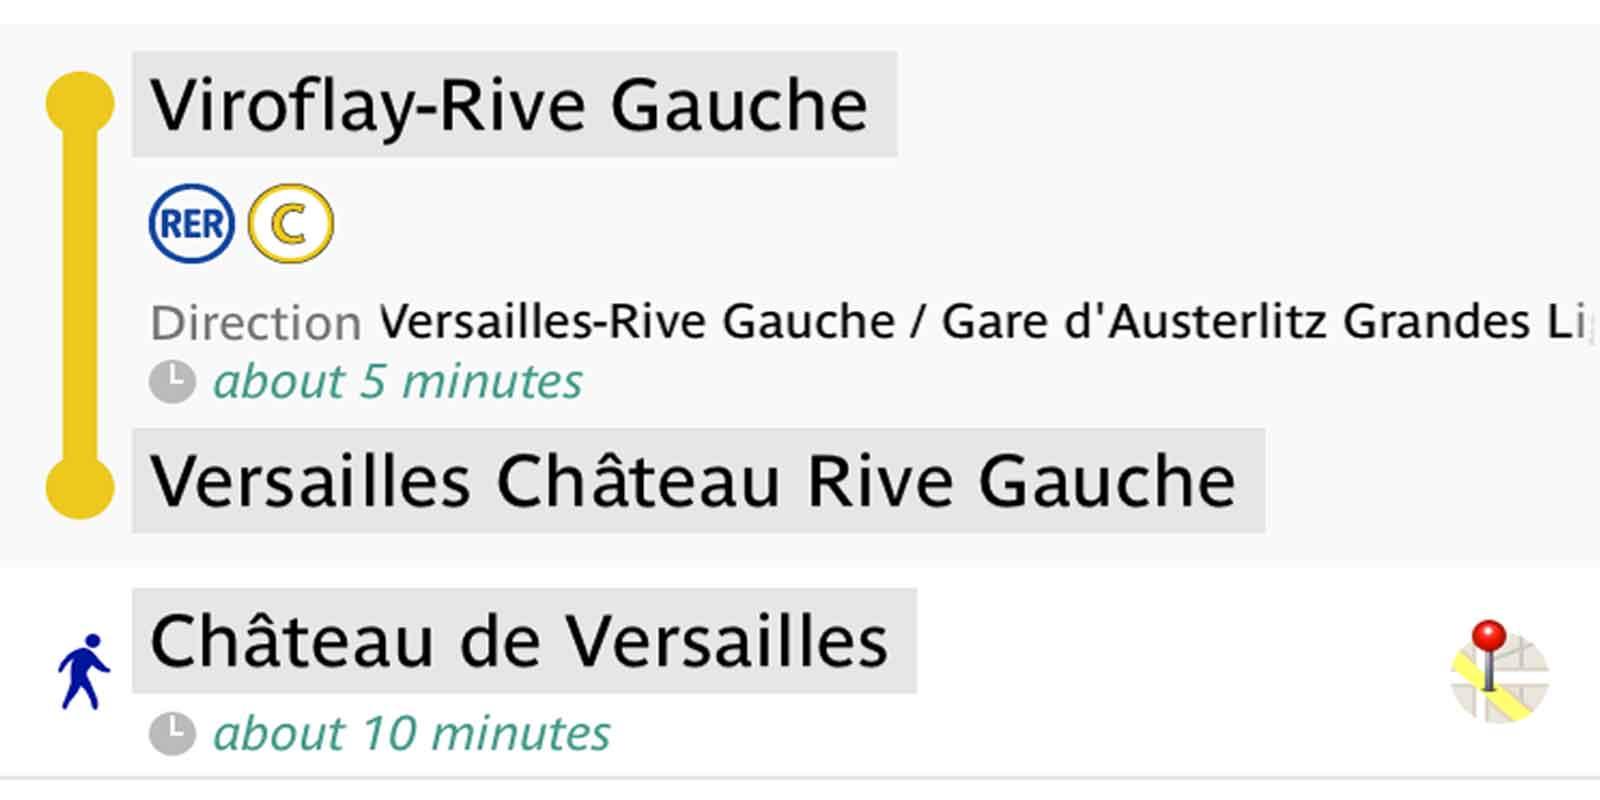 Screenshot of directions to Chateau de Versailles via Paris RER train.